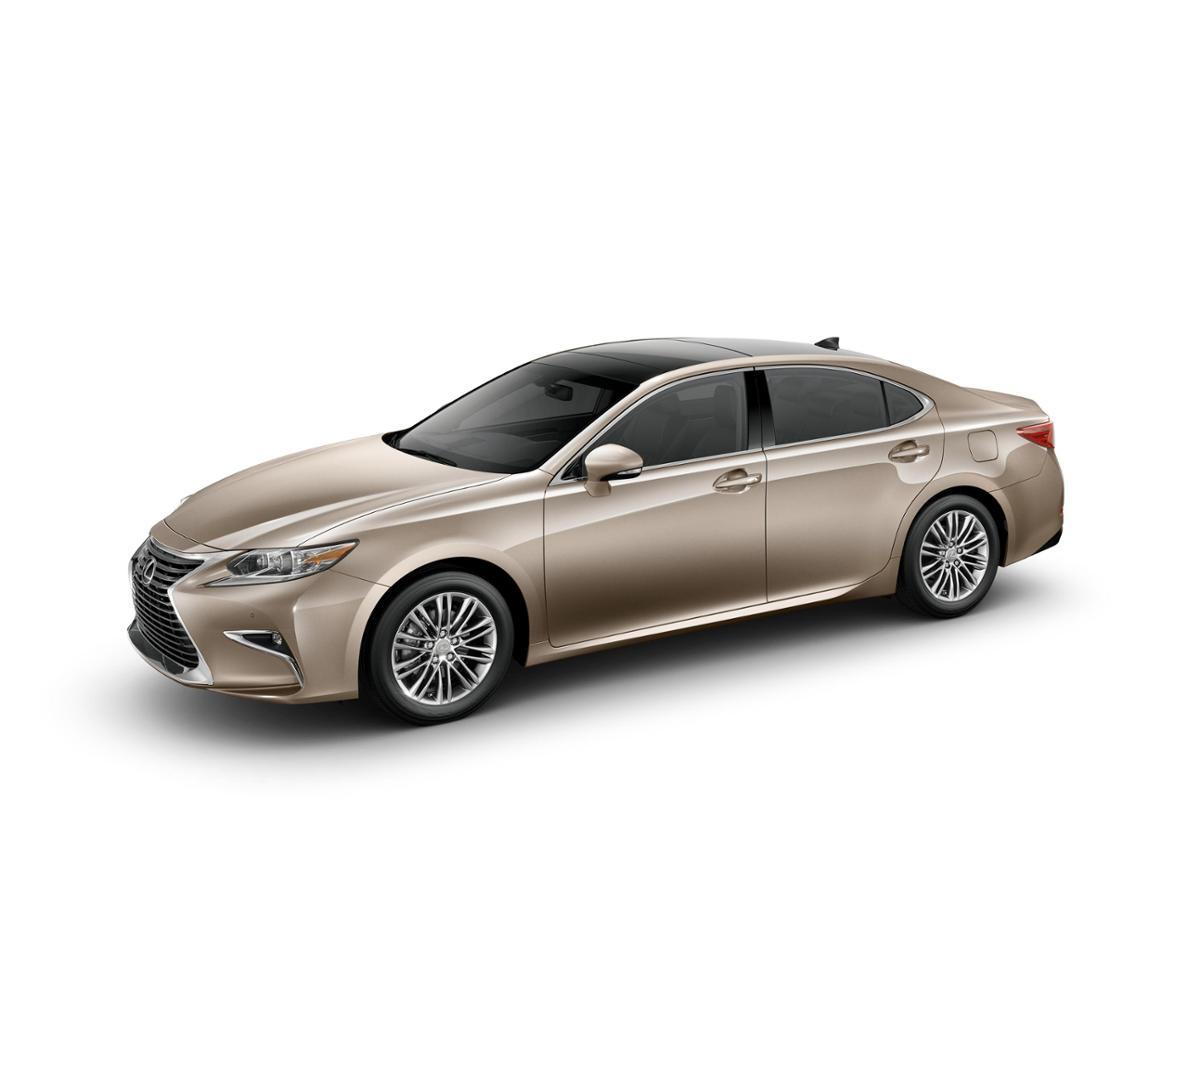 Herrin Gear Lexus >> 2017 Lexus ES 350 - Jackson, MS - Herrin-Gear Lexus - X19246A